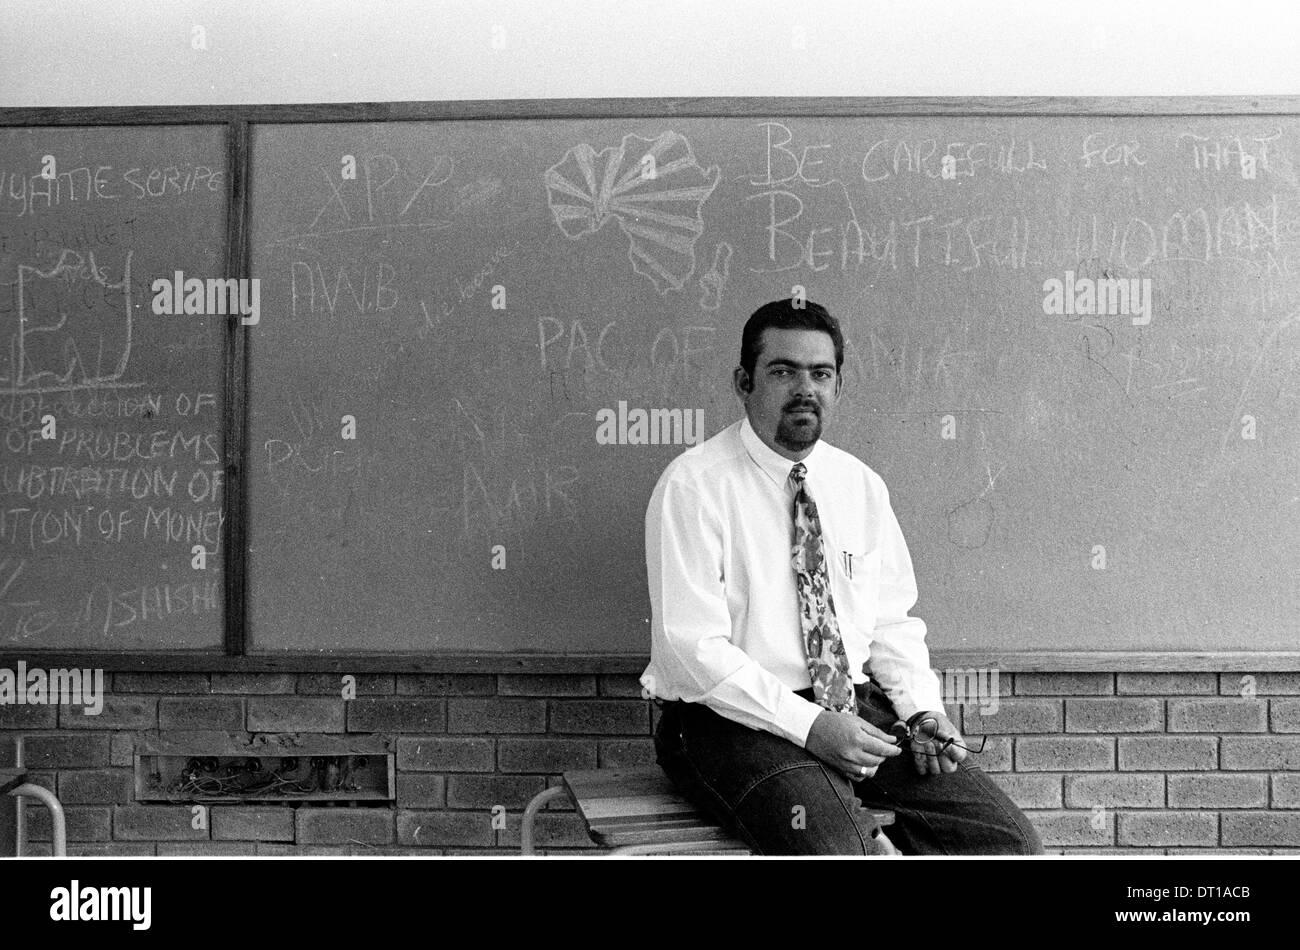 WHITE TEACHER IN TOWNSHIP SCHOOL. 1995 VENTERSDORP SOUTH AFRICA PHOTO/JOHN ROBINSON - Stock Image